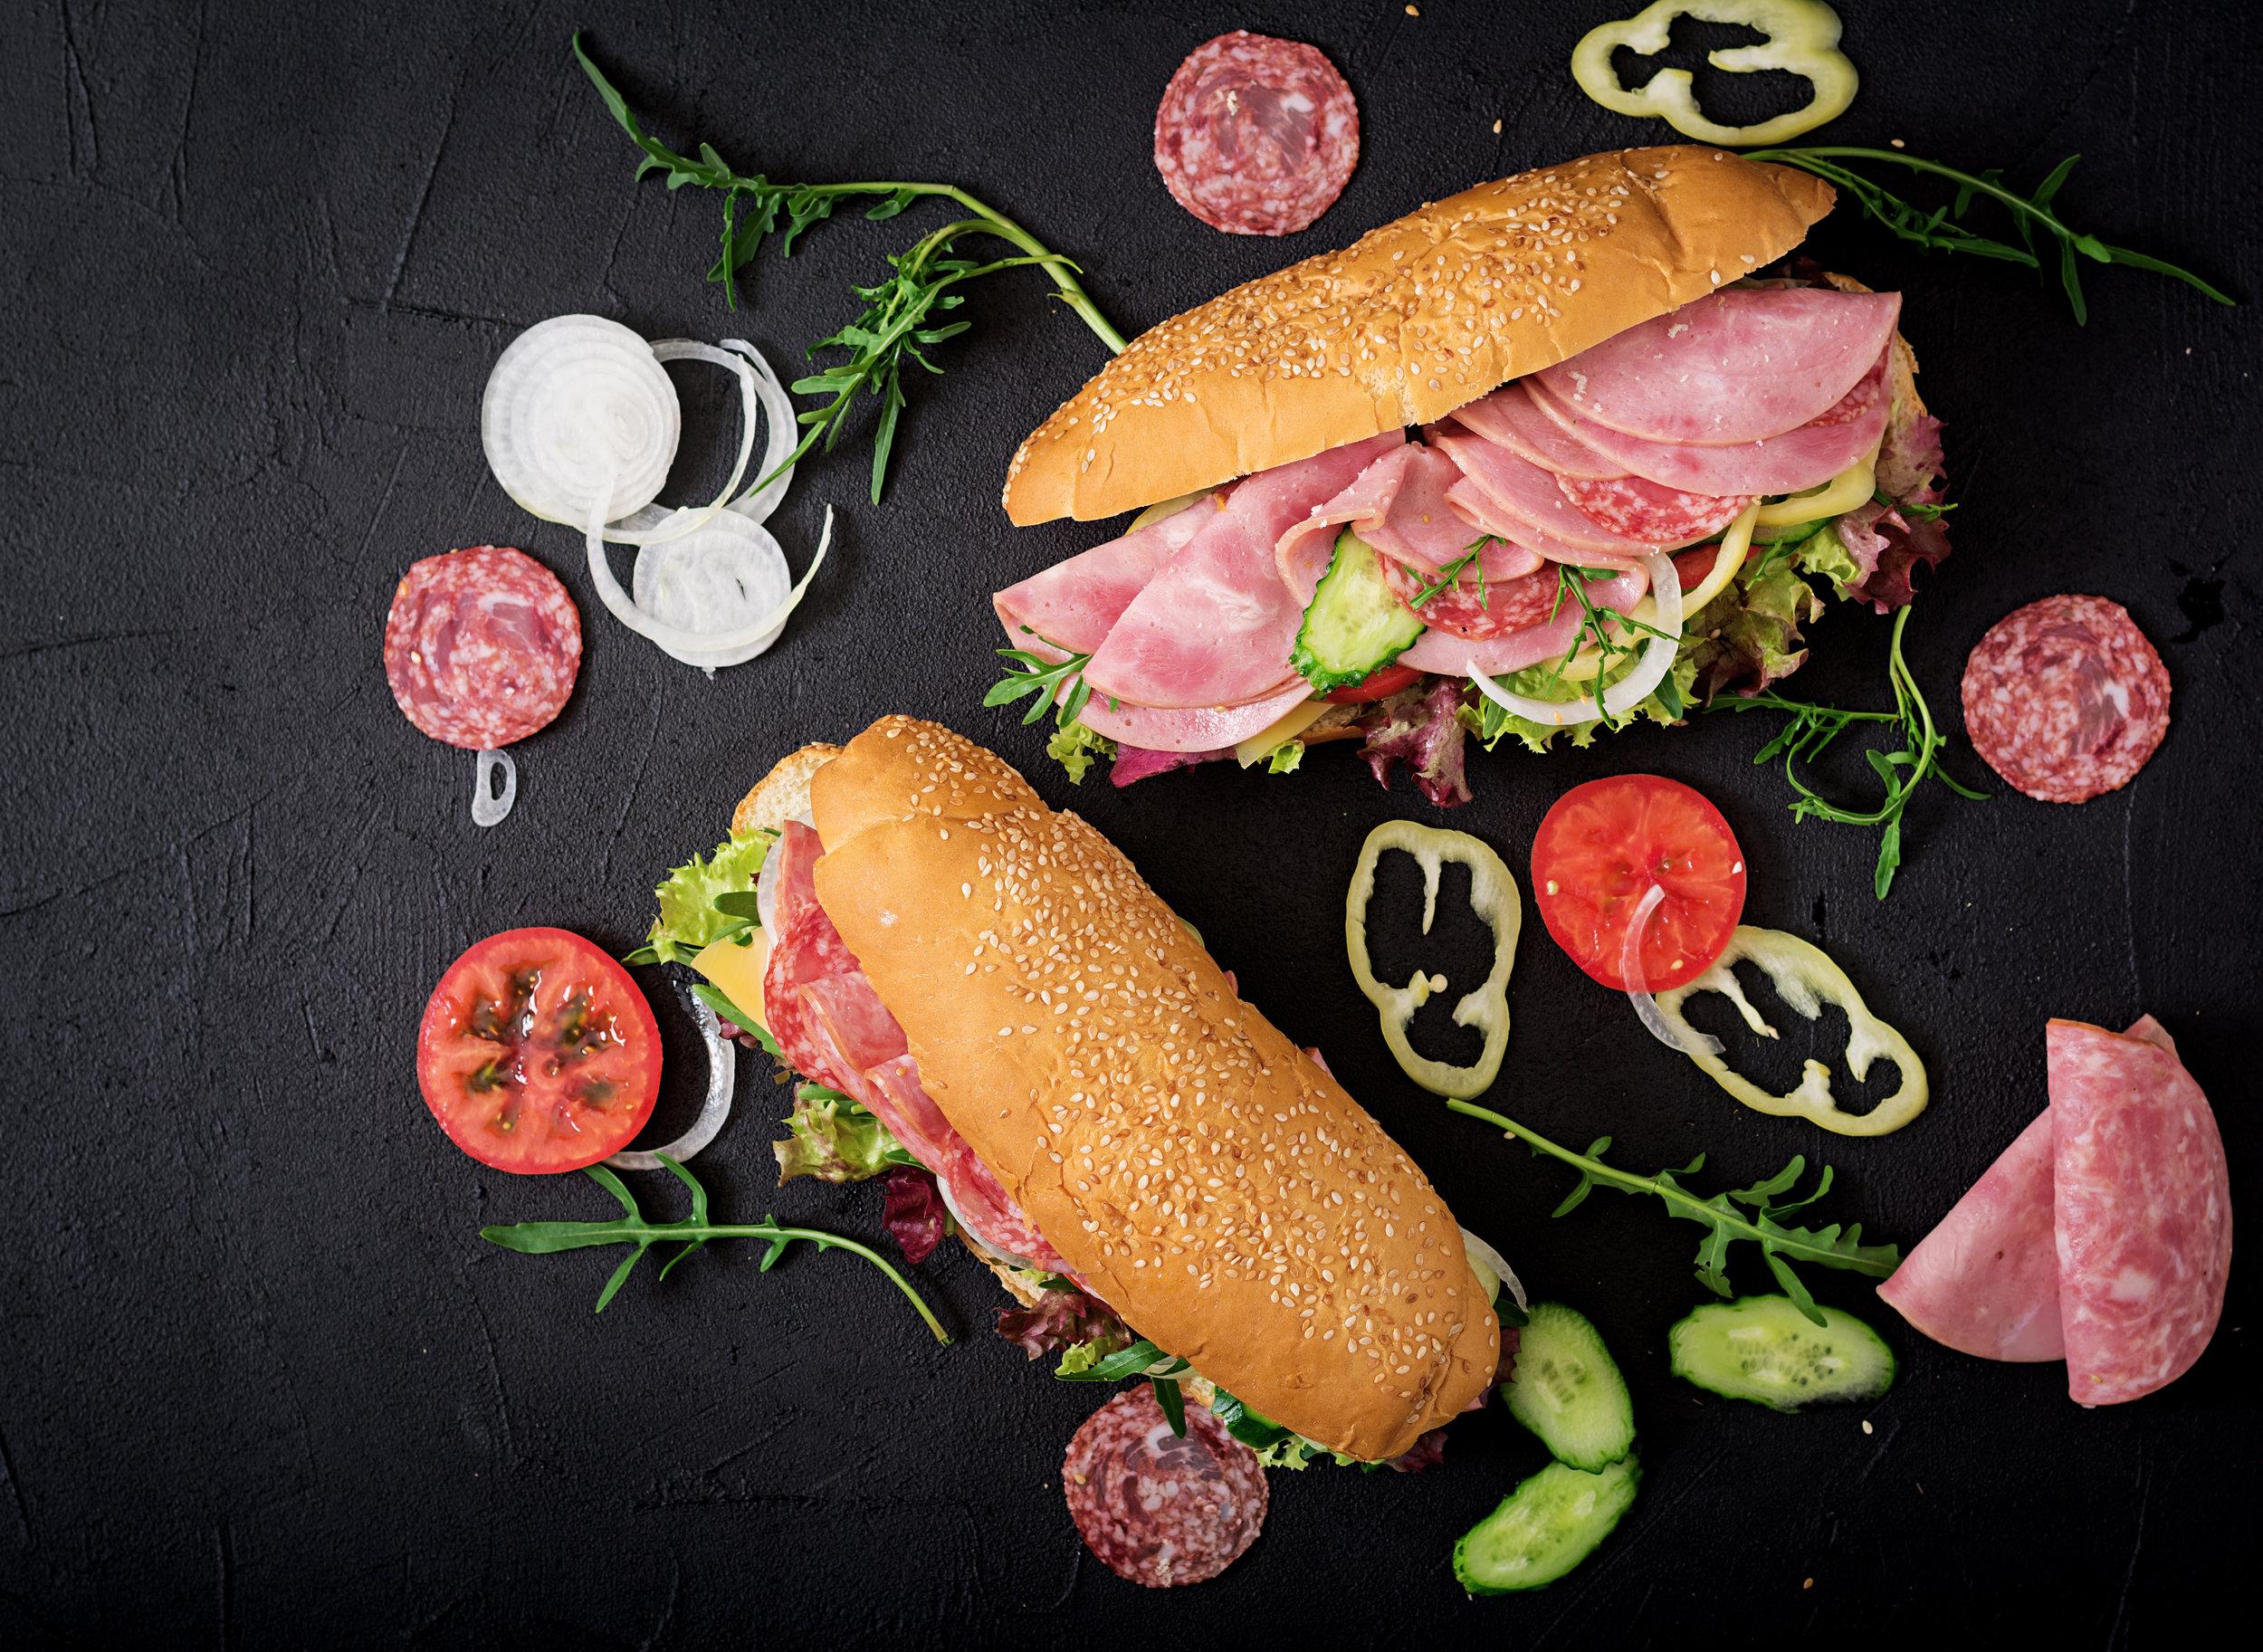 big-sandwich-with-ham-salami-tomato-cucumber-and-PYY8RF7.jpg